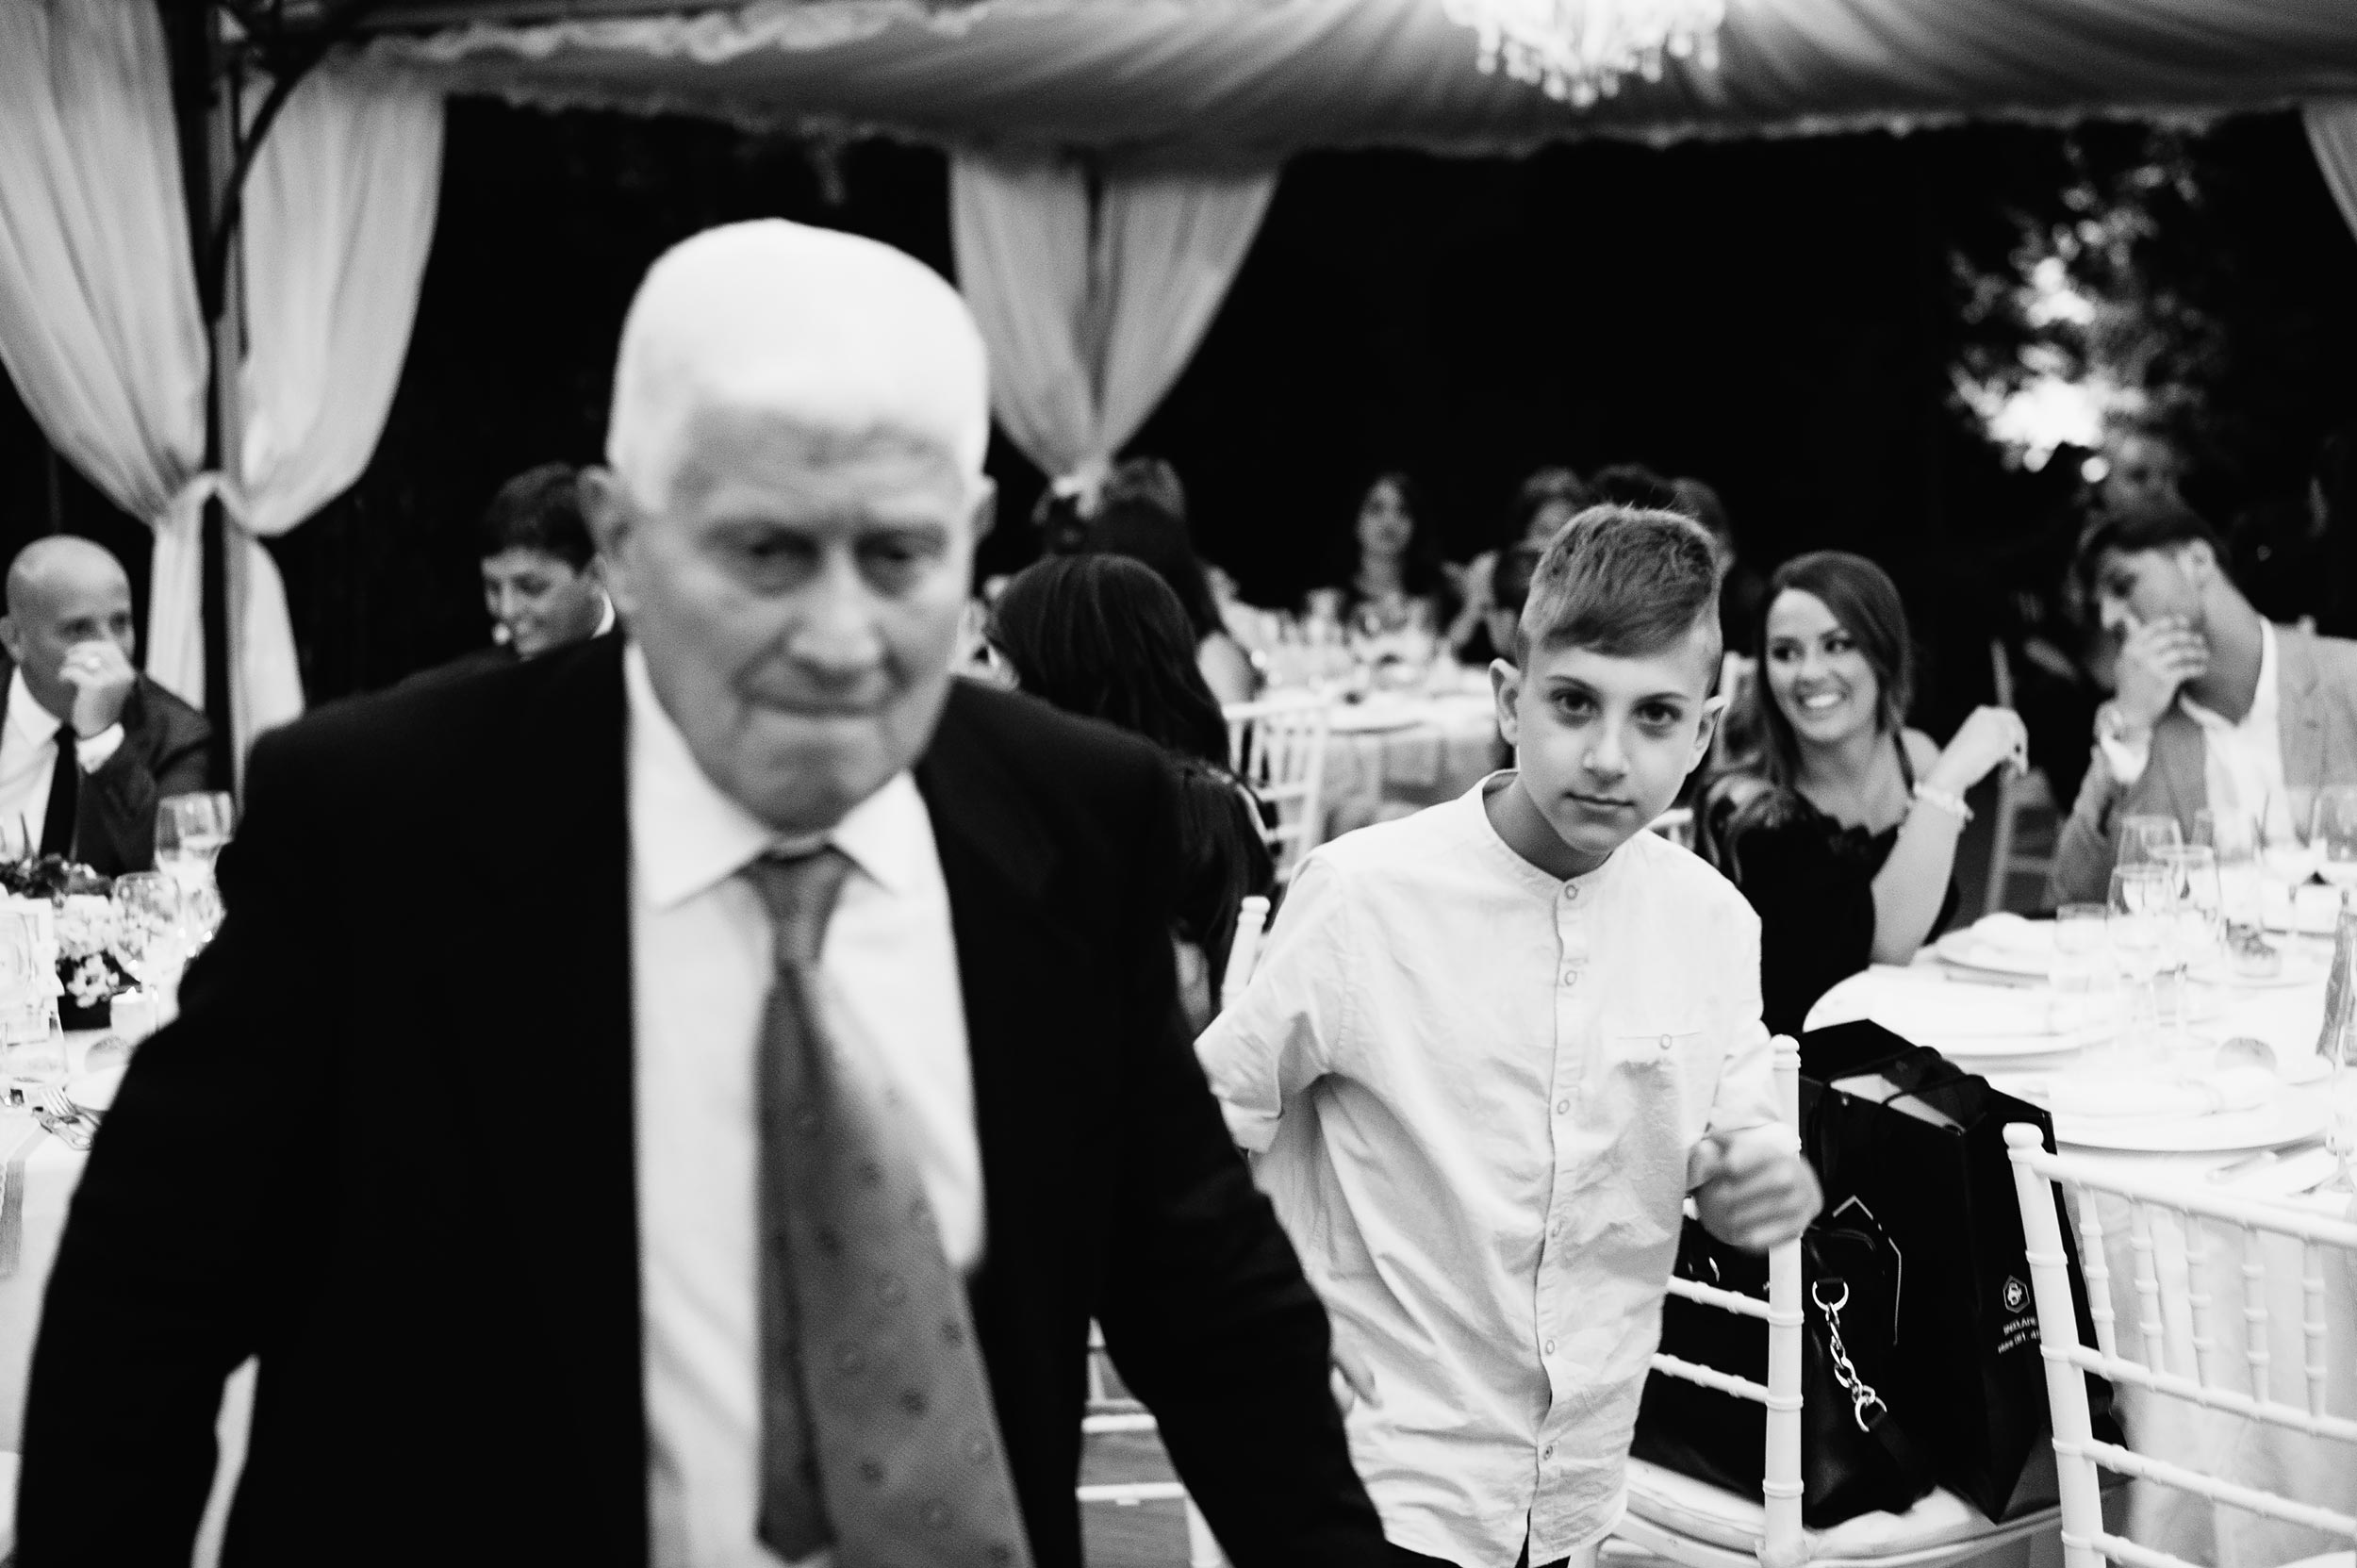 2016-Claudio-Teresa-Naples-Wedding-Photographer-Italy-Alessandro-Avenali-89.jpg